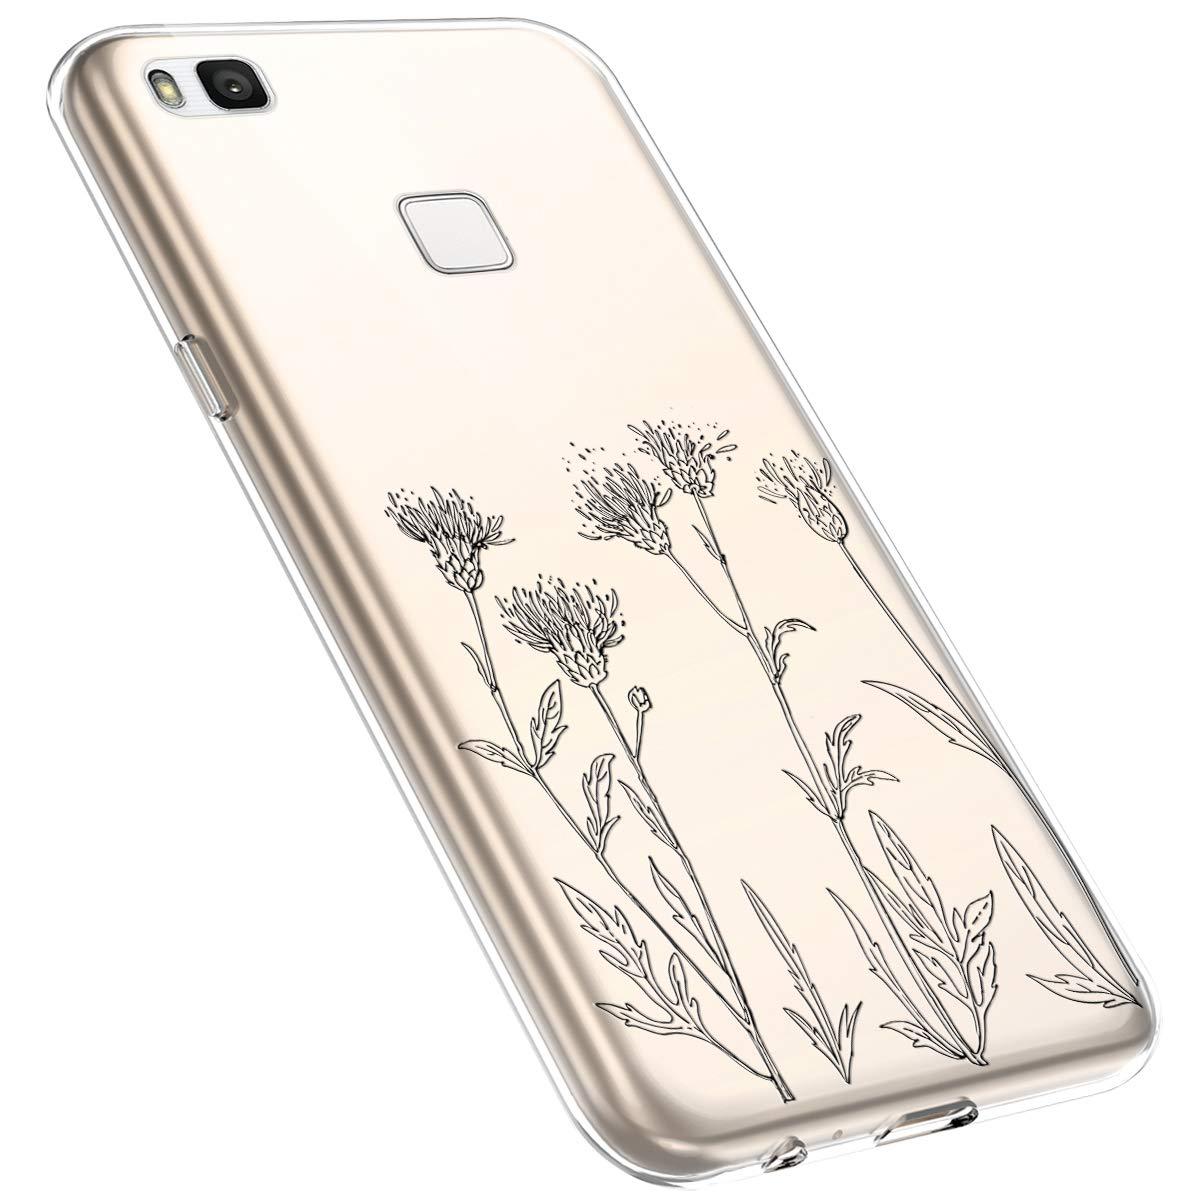 MoreChioce kompatibel mit Huawei P9 Lite H/ülle,Huawei P9 Lite Handyh/ülle Blume,Ultra D/ünn Transparent Weiche Silikon Schutzh/ülle Clear Crystal R/ückschale Tasche Defender Bumper,Blumenzweig #1